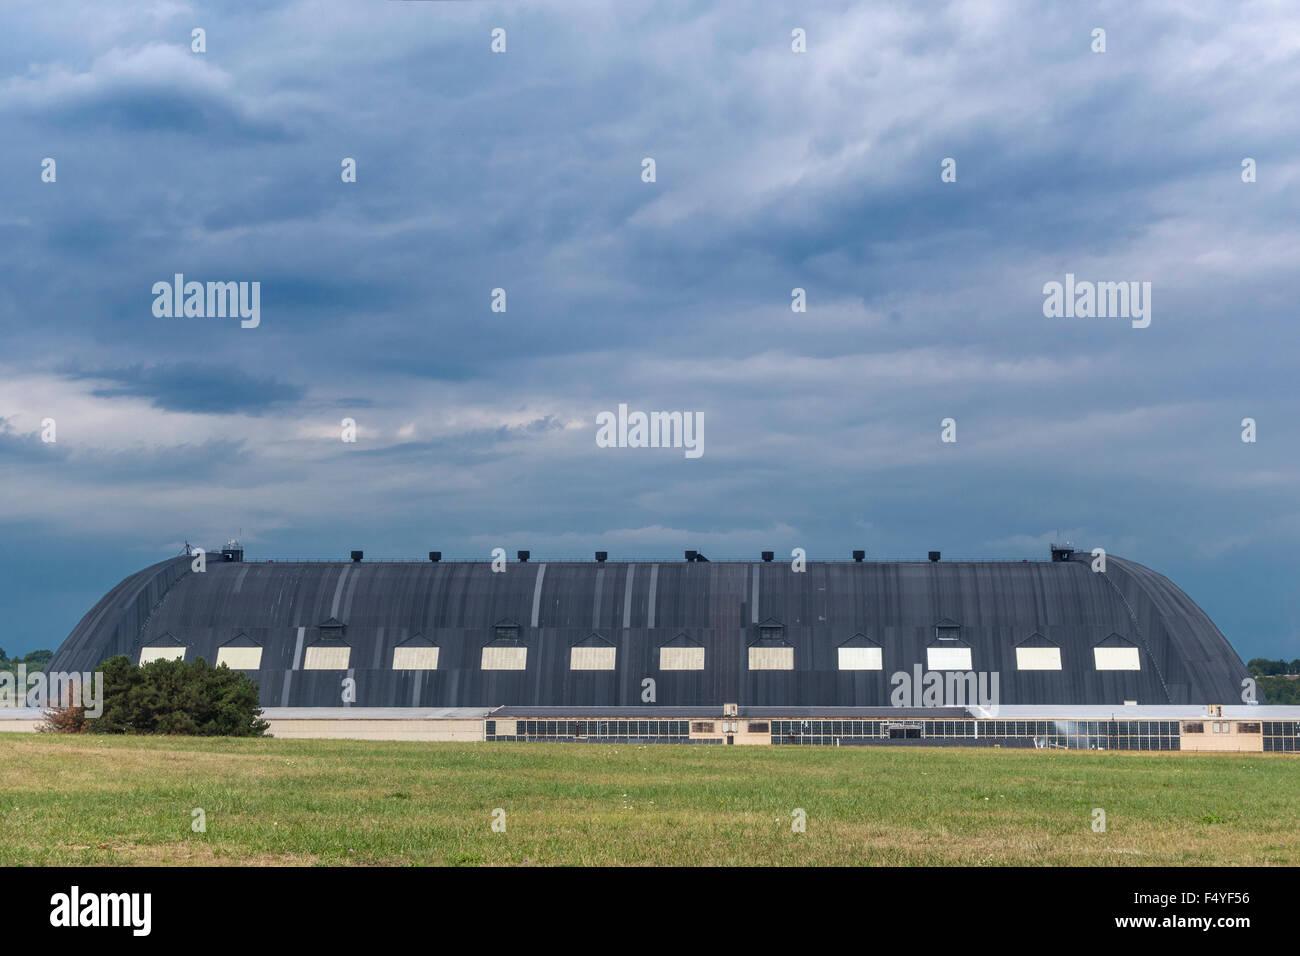 https://c7.alamy.com/comp/F4YF56/akron-ohio-blimp-hangar-originally-goodyear-zeppelin-airdock-now-owned-F4YF56.jpg